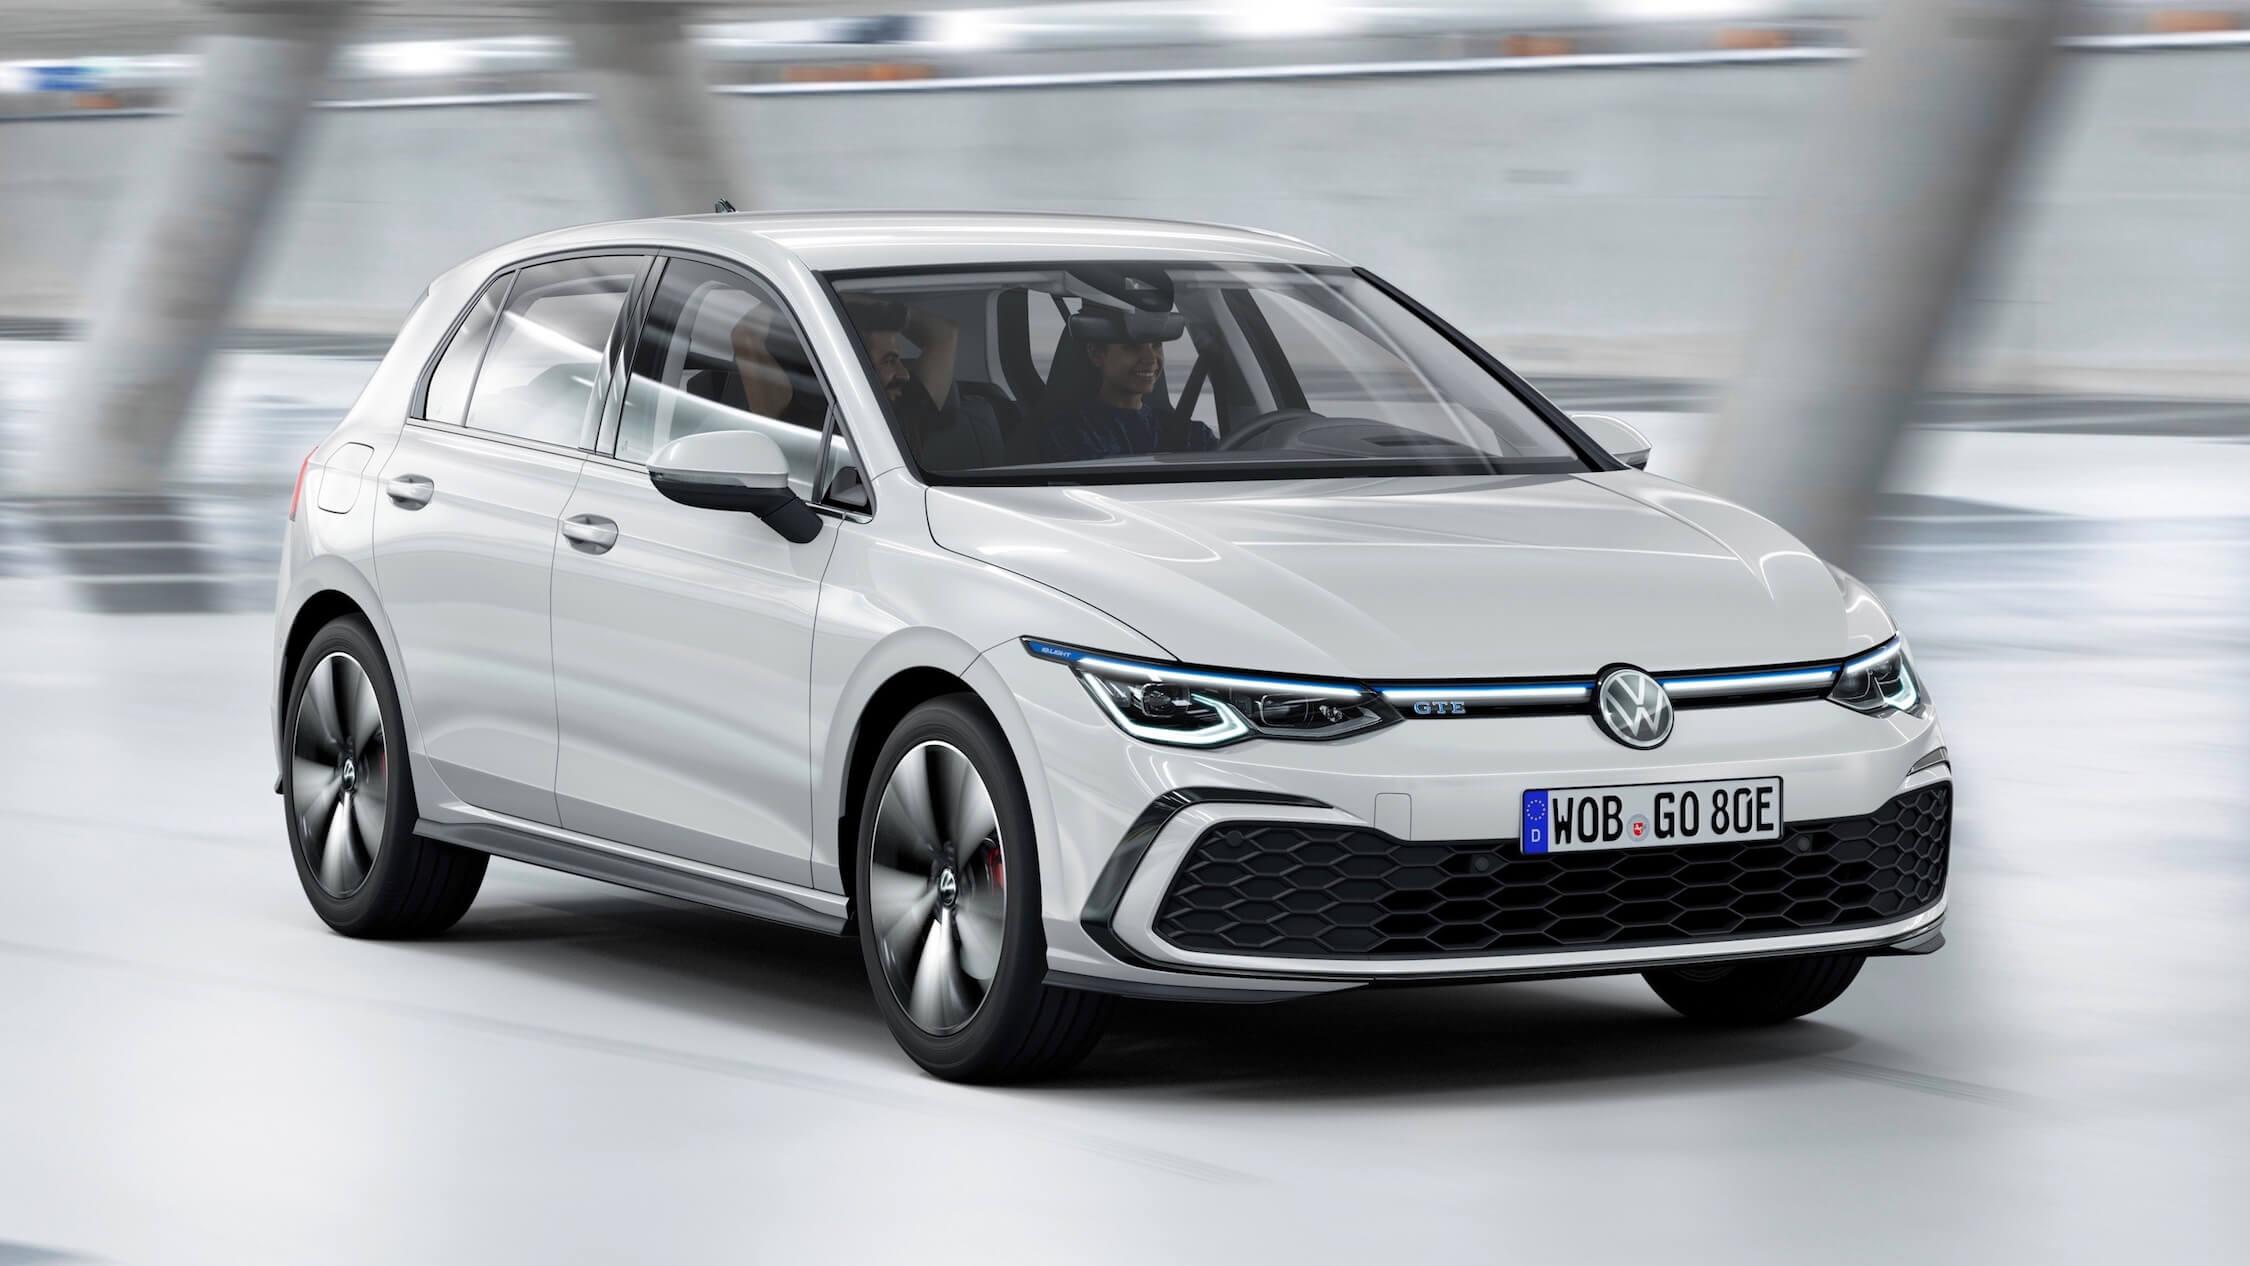 2020 Volkswagen Golf híbrido